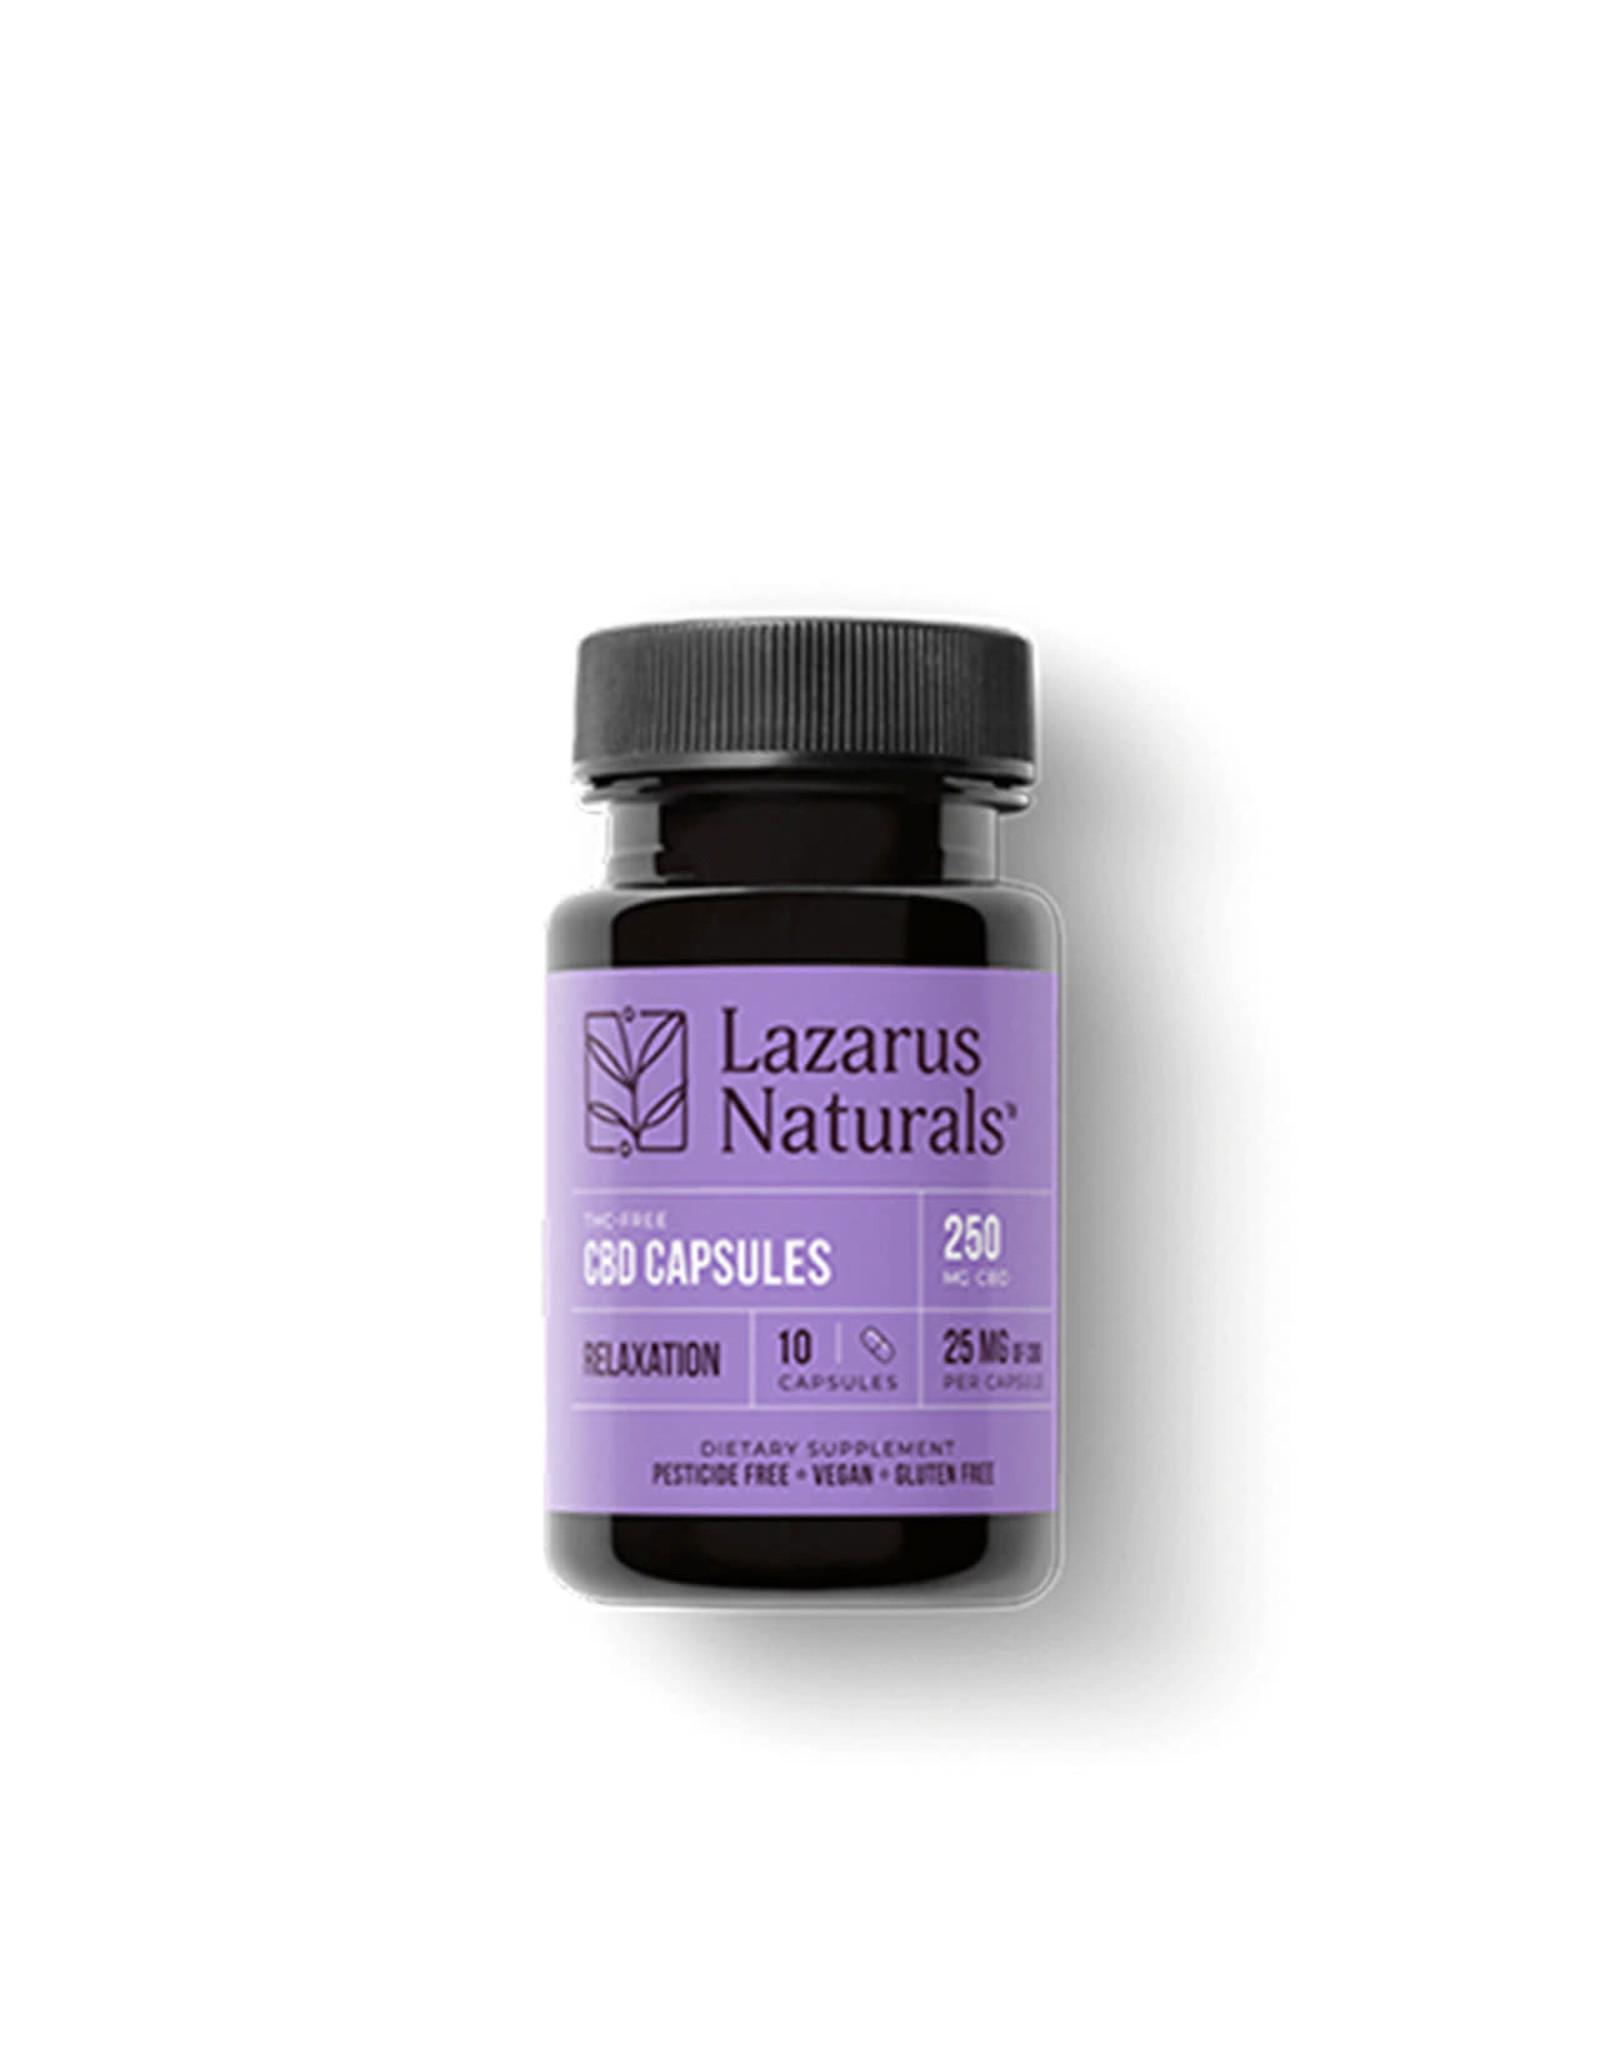 Lazarus Naturals Lazarus Naturals Capsules Relaxation 25mg 10ct